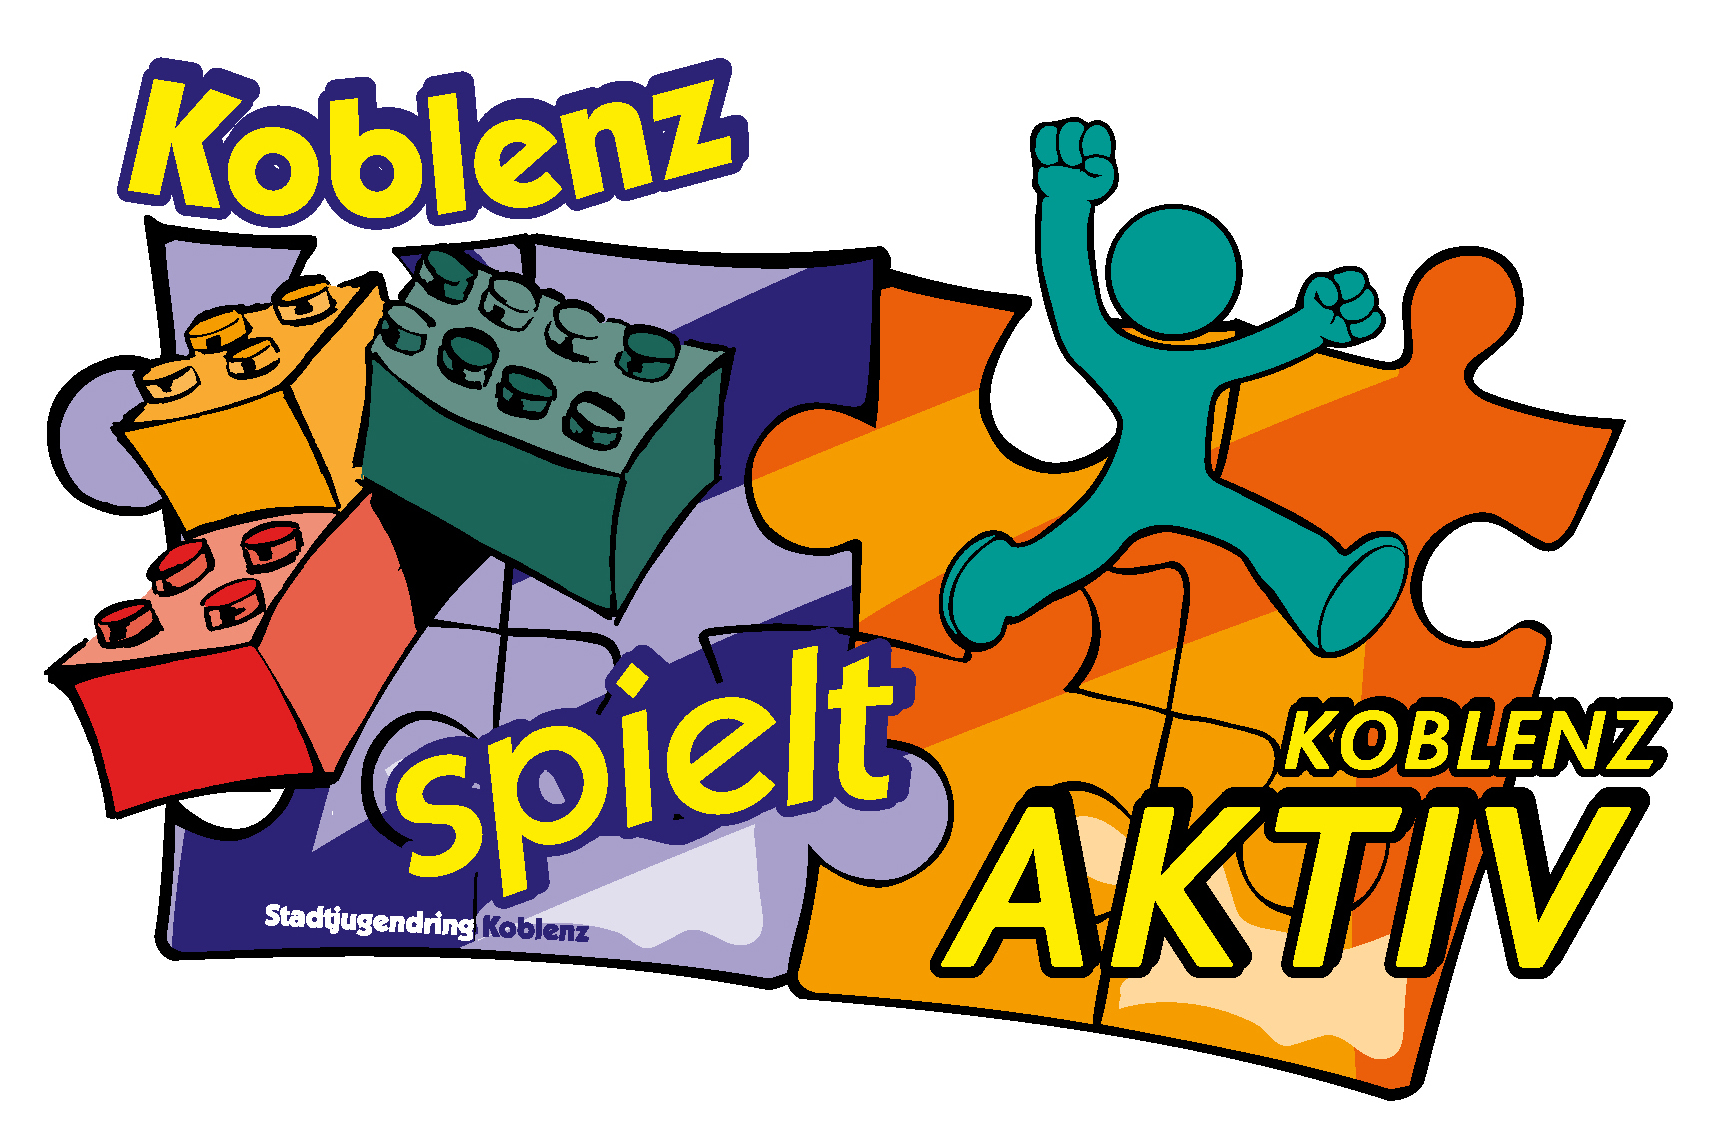 Single events koblenz